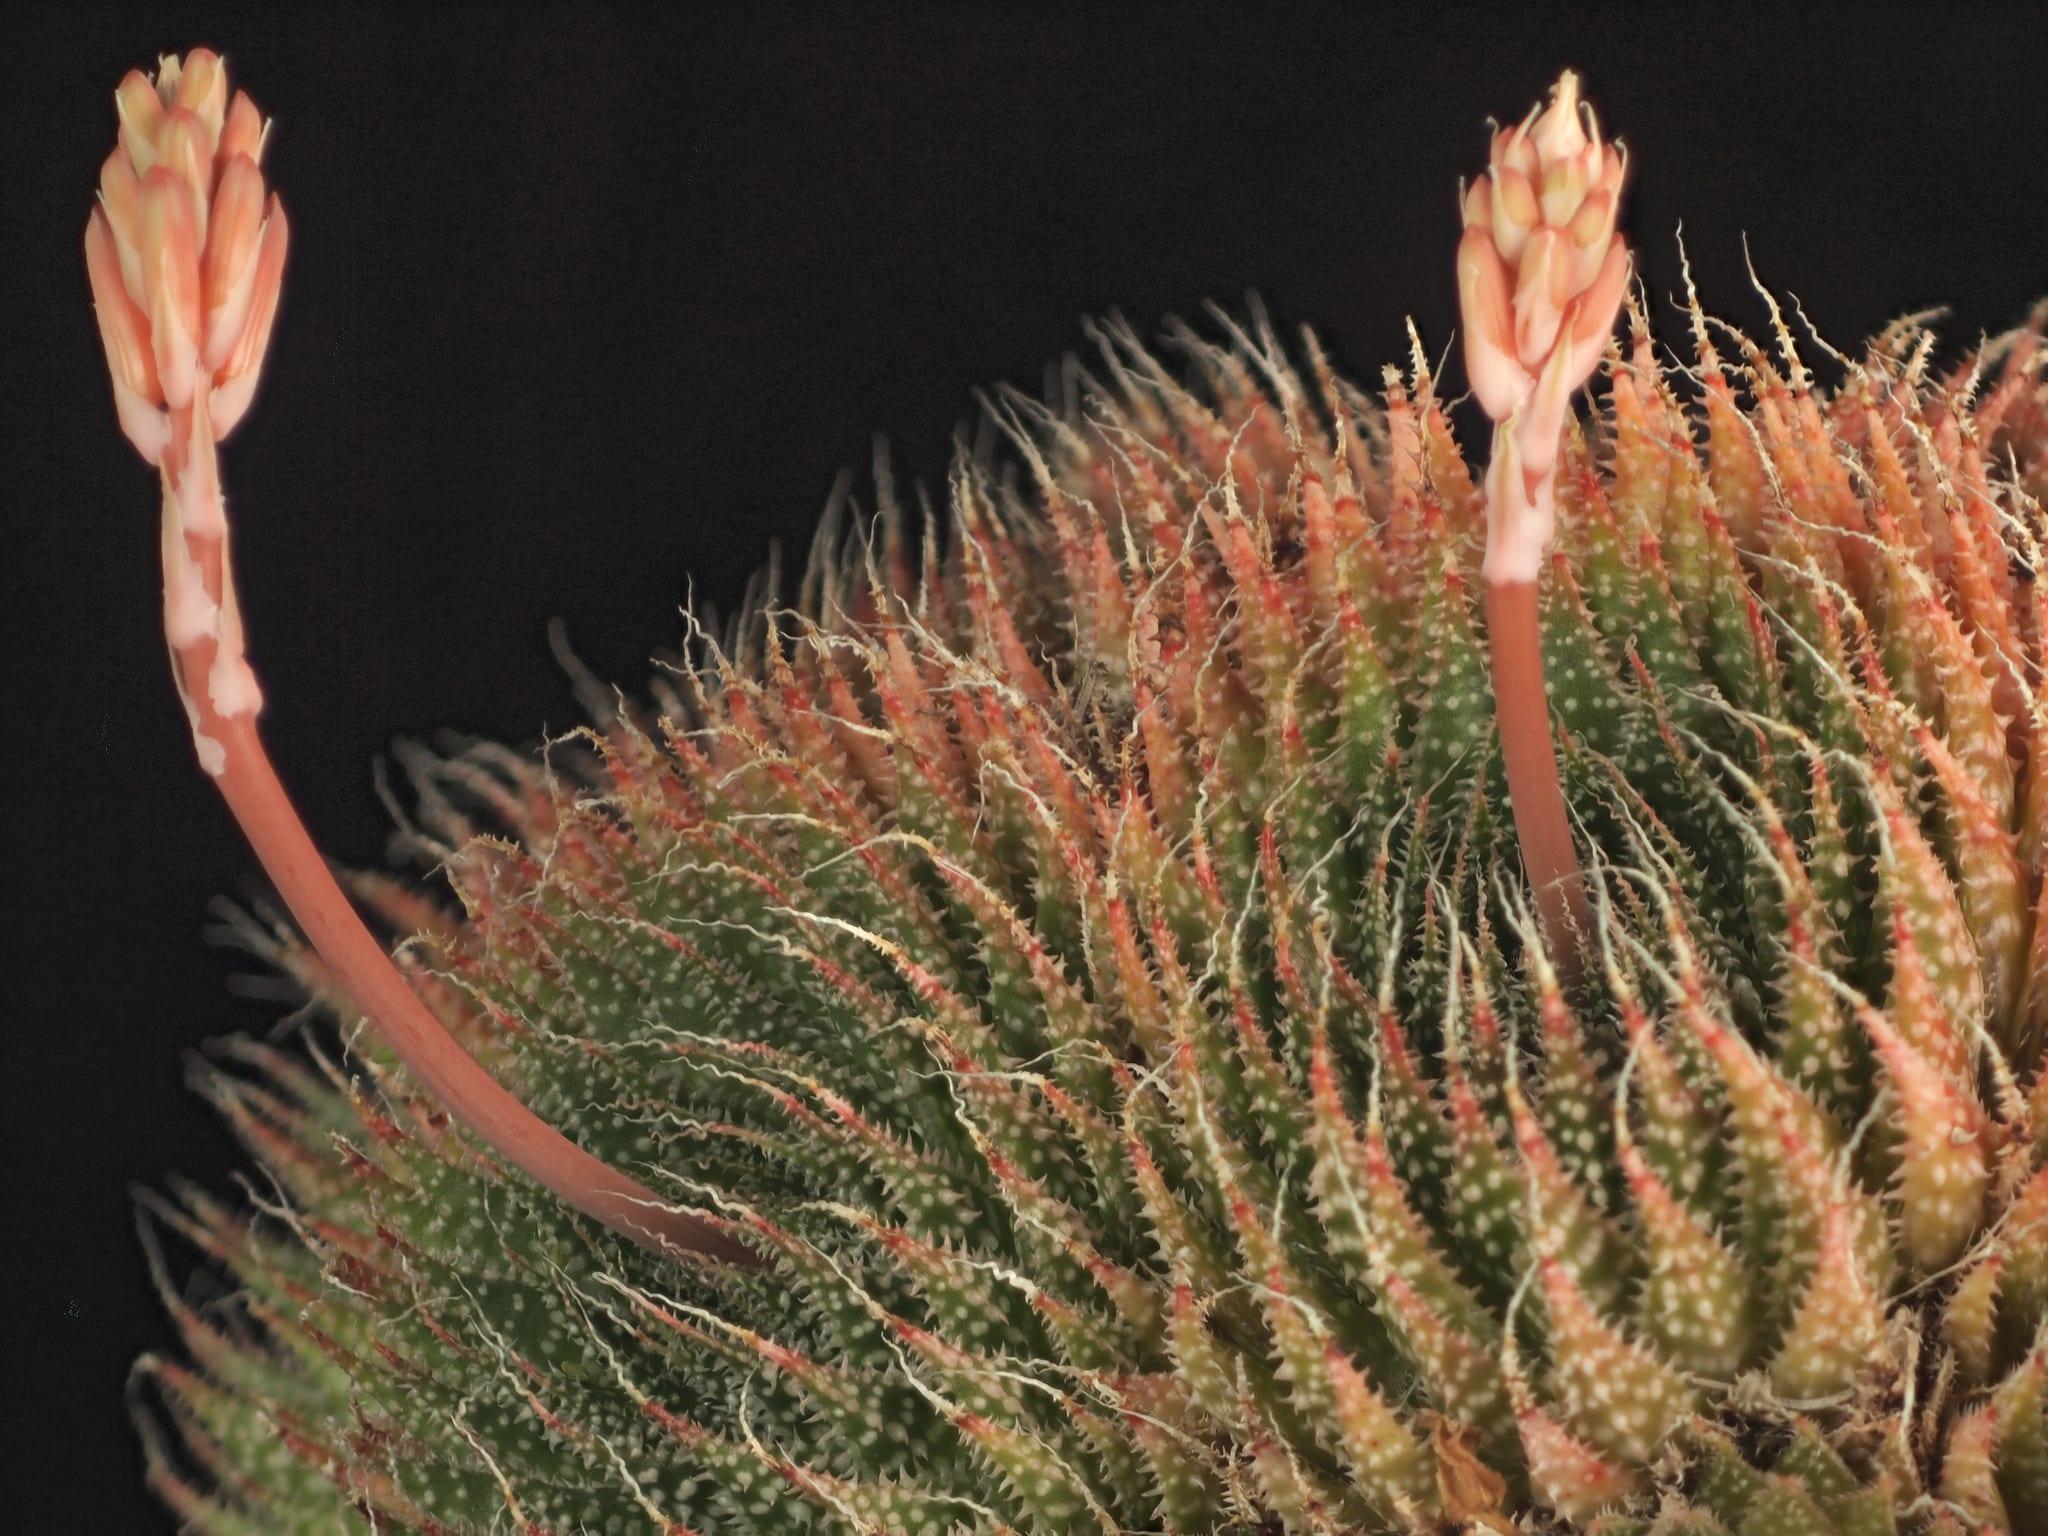 Aloe aristata en flor